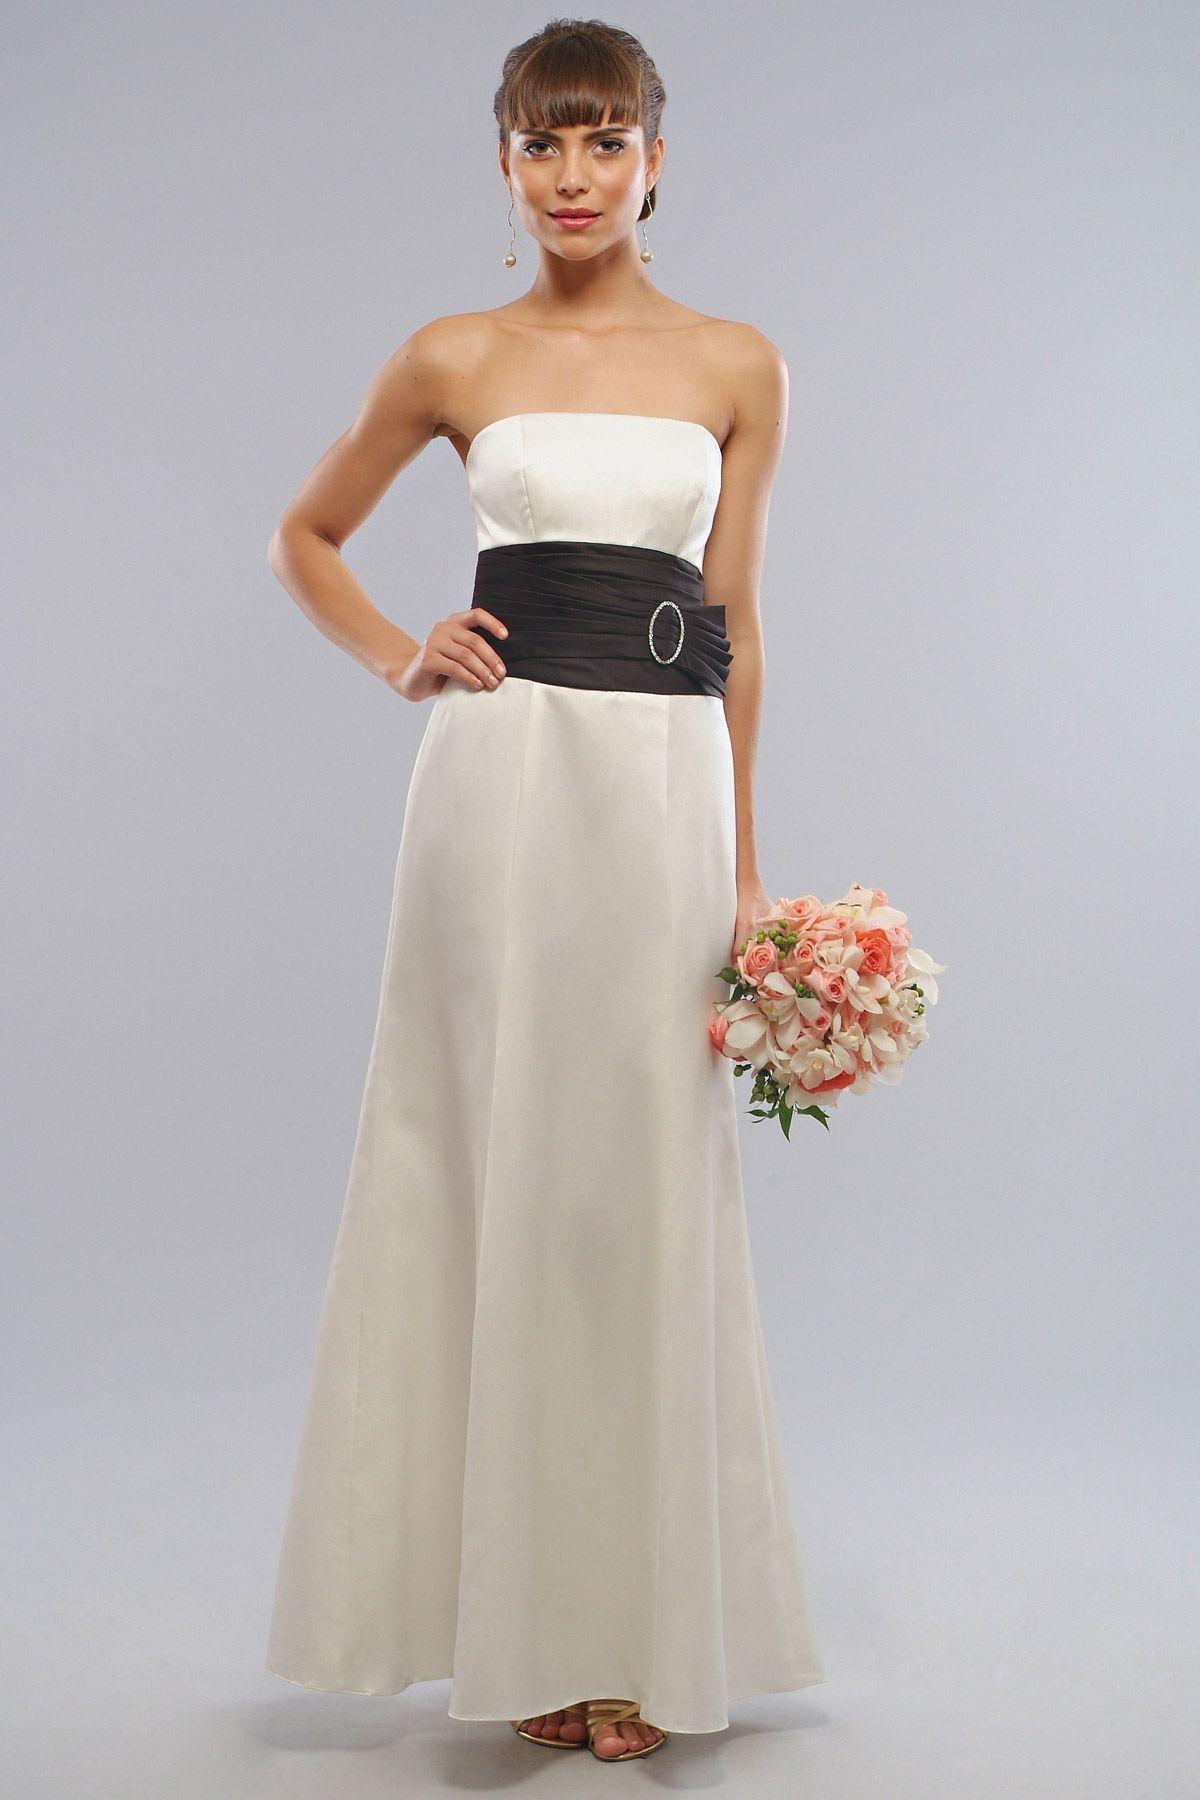 Beautiful colour medynasty burchett pinterest woman gowns